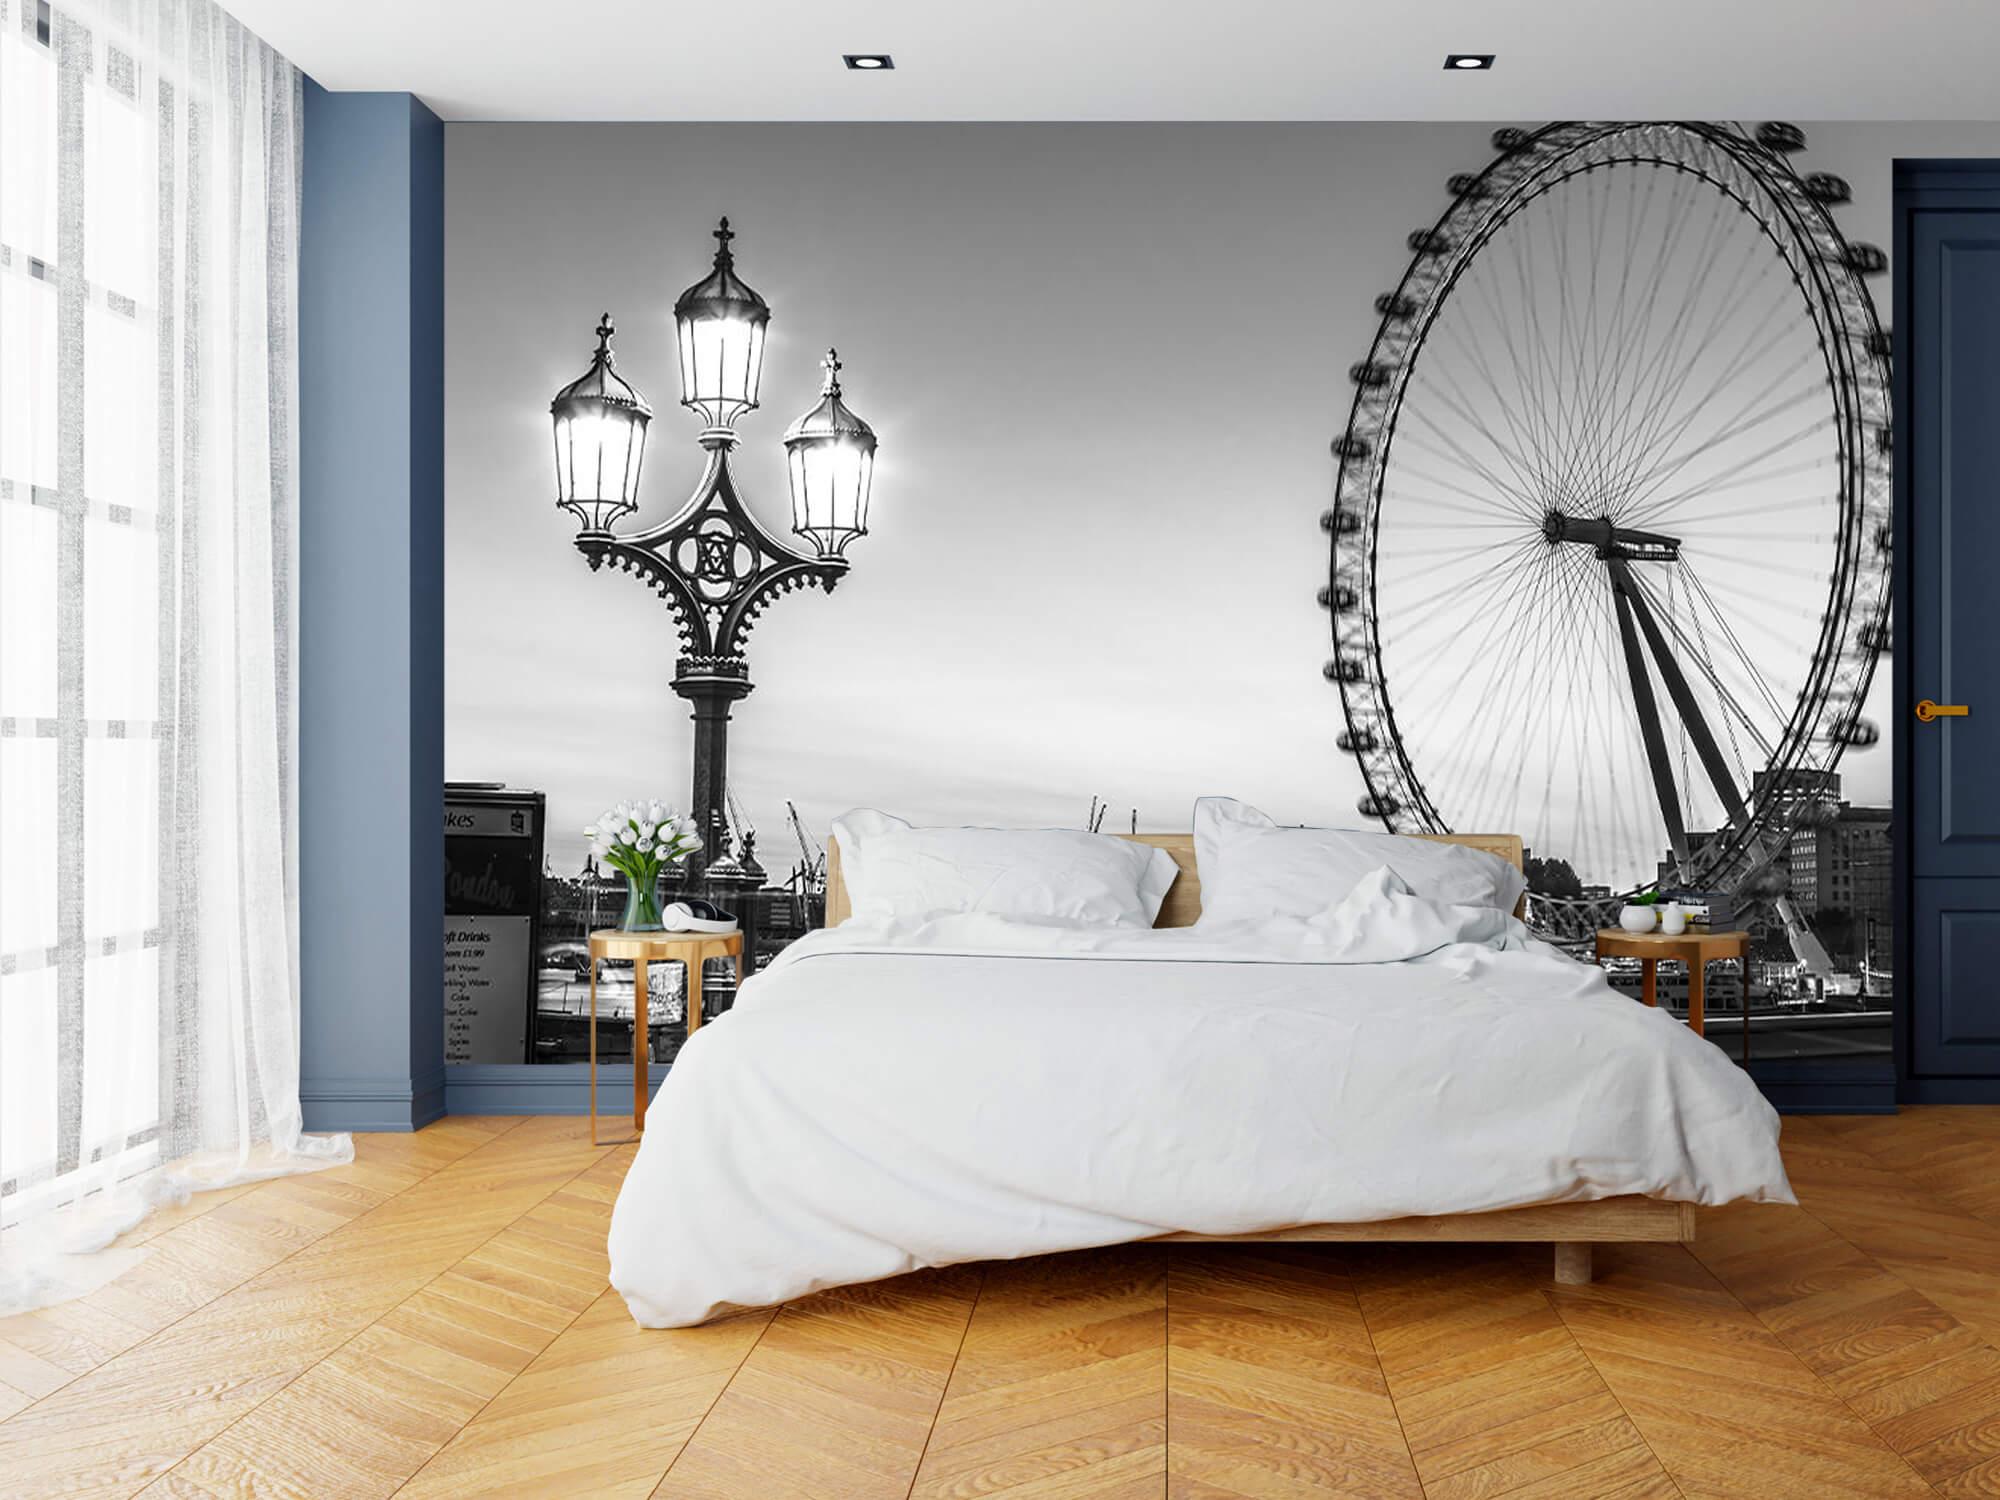 Ferris wheel black and white 13